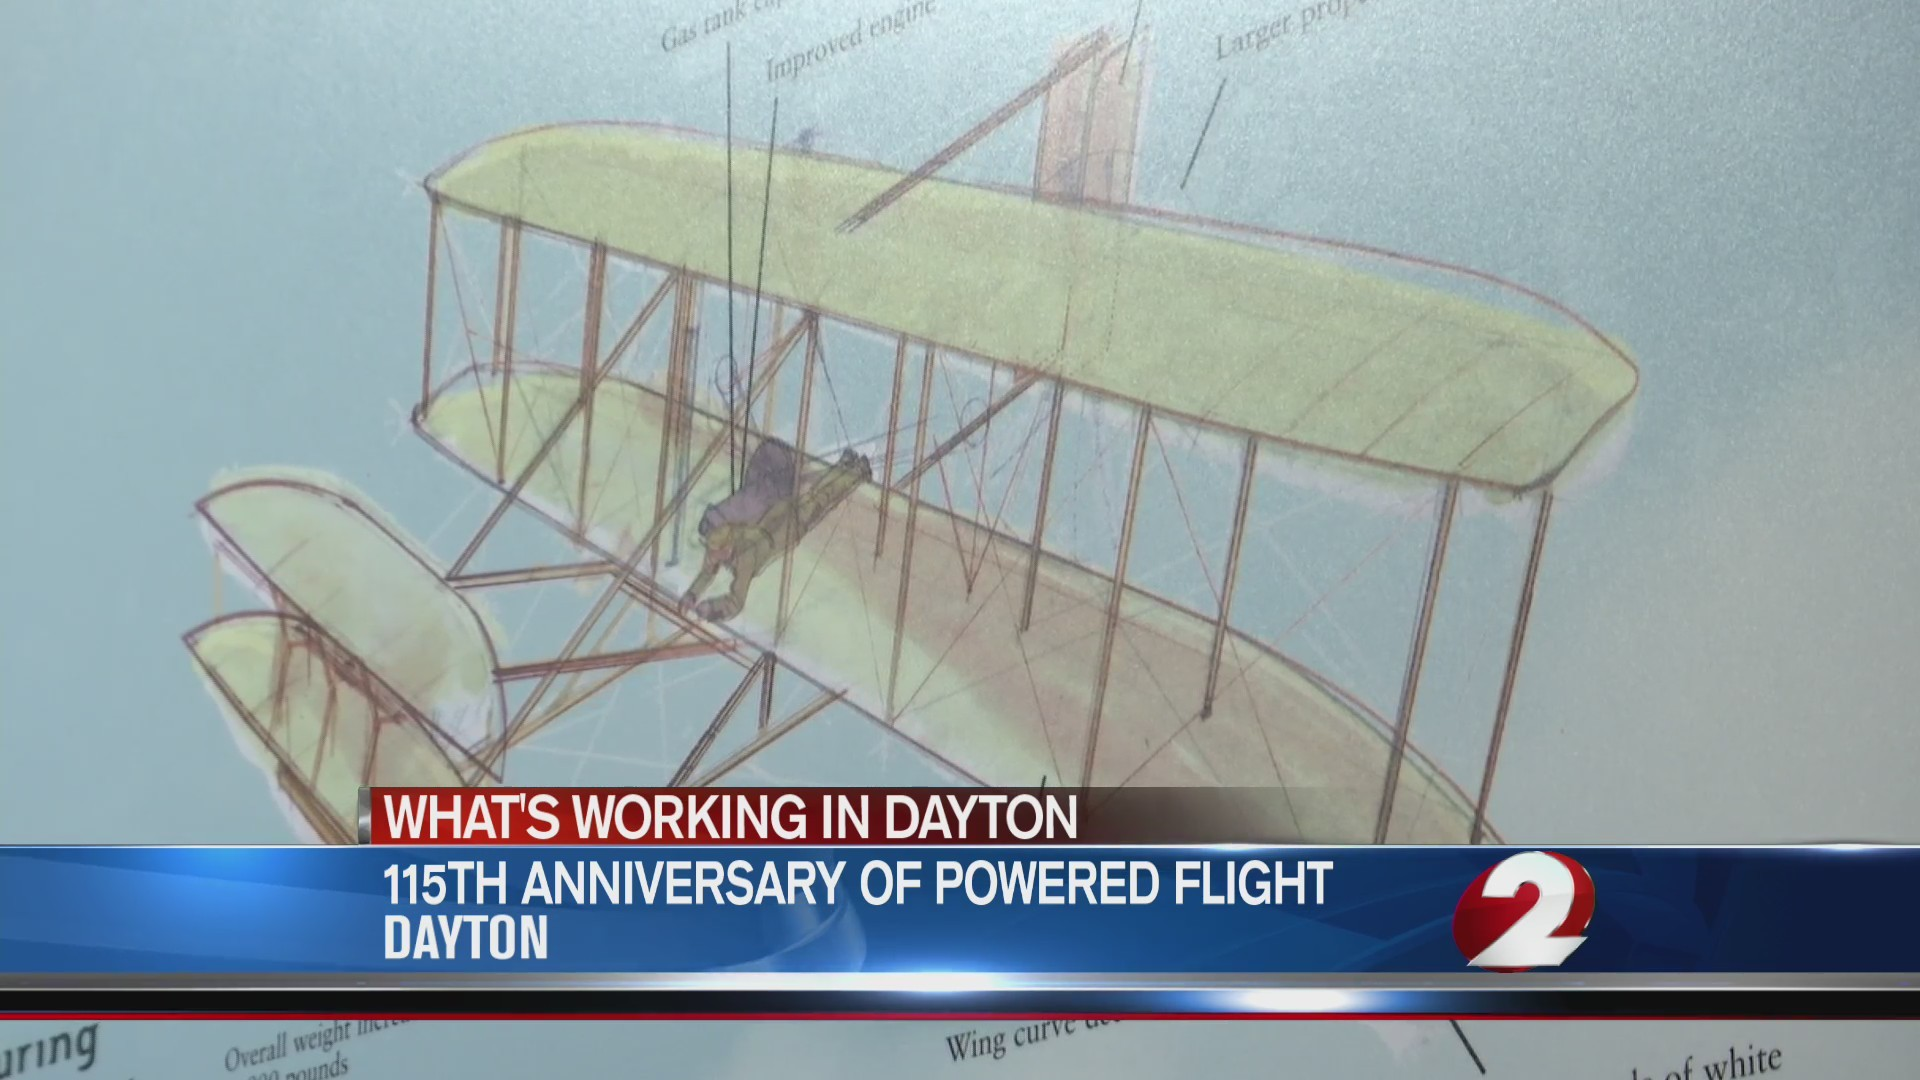 115th anniversary of powered flight